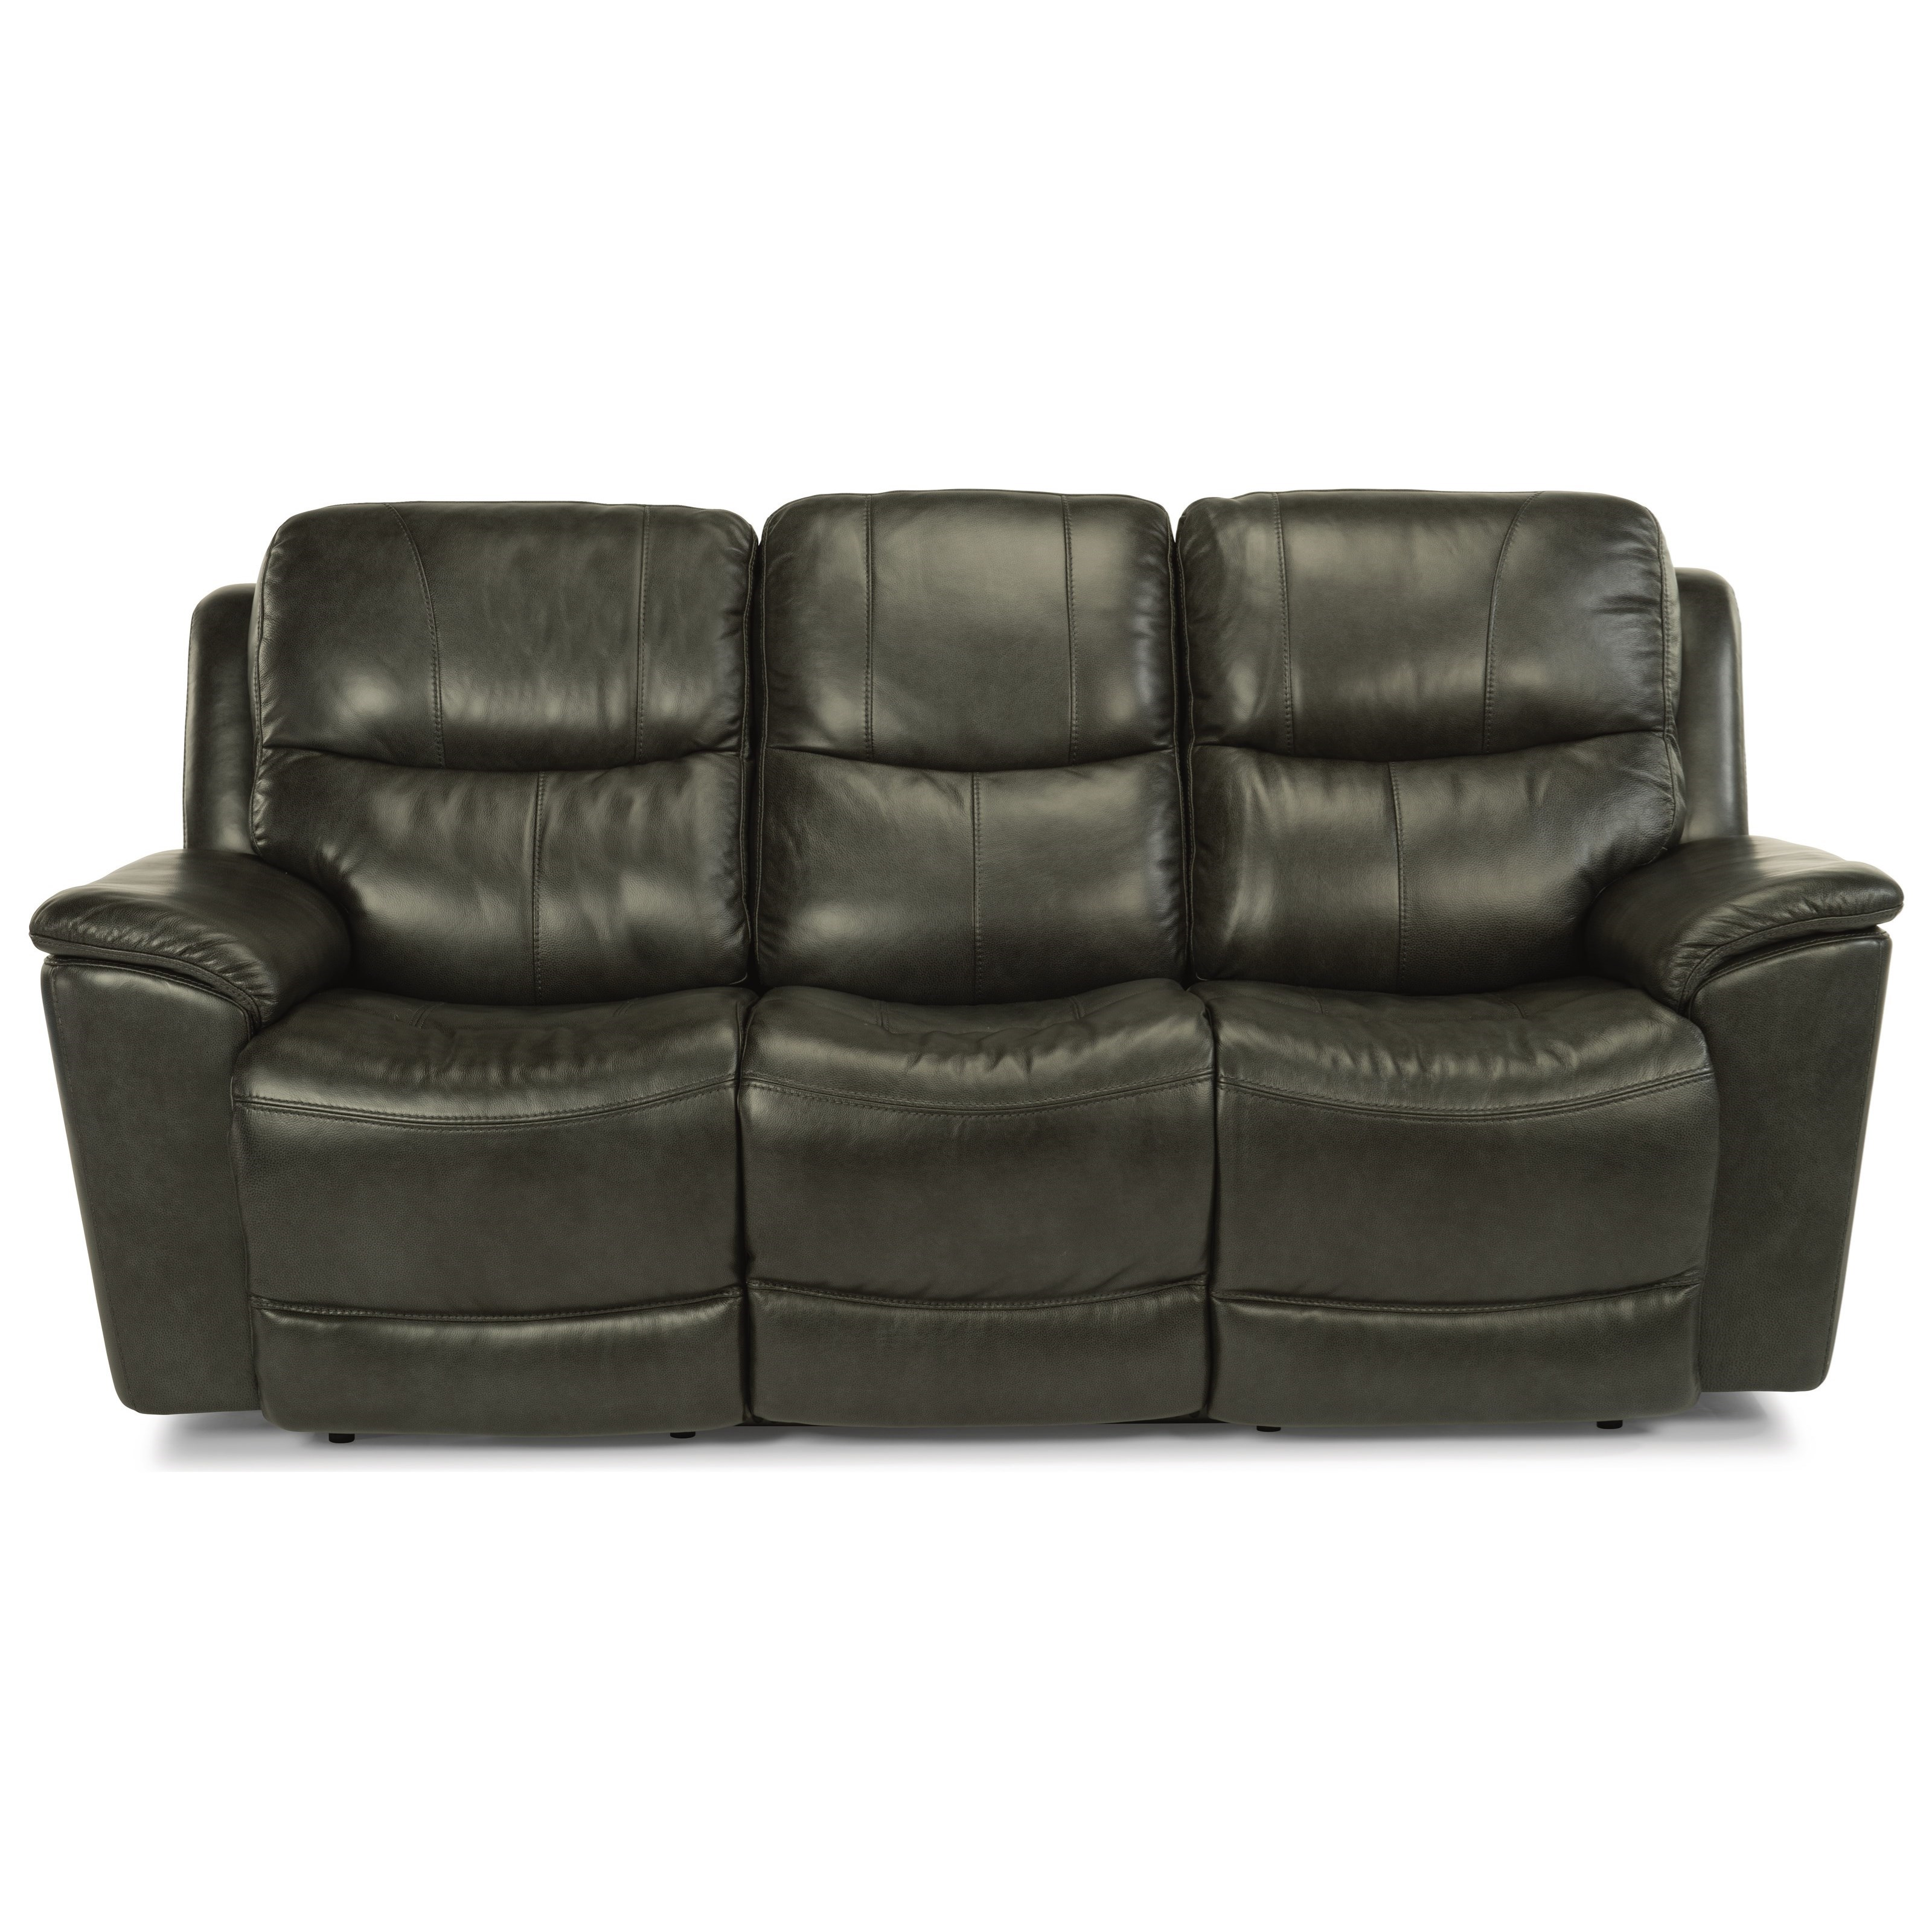 Latitudes - Cade Power Reclining Sofa by Flexsteel at Walker's Furniture